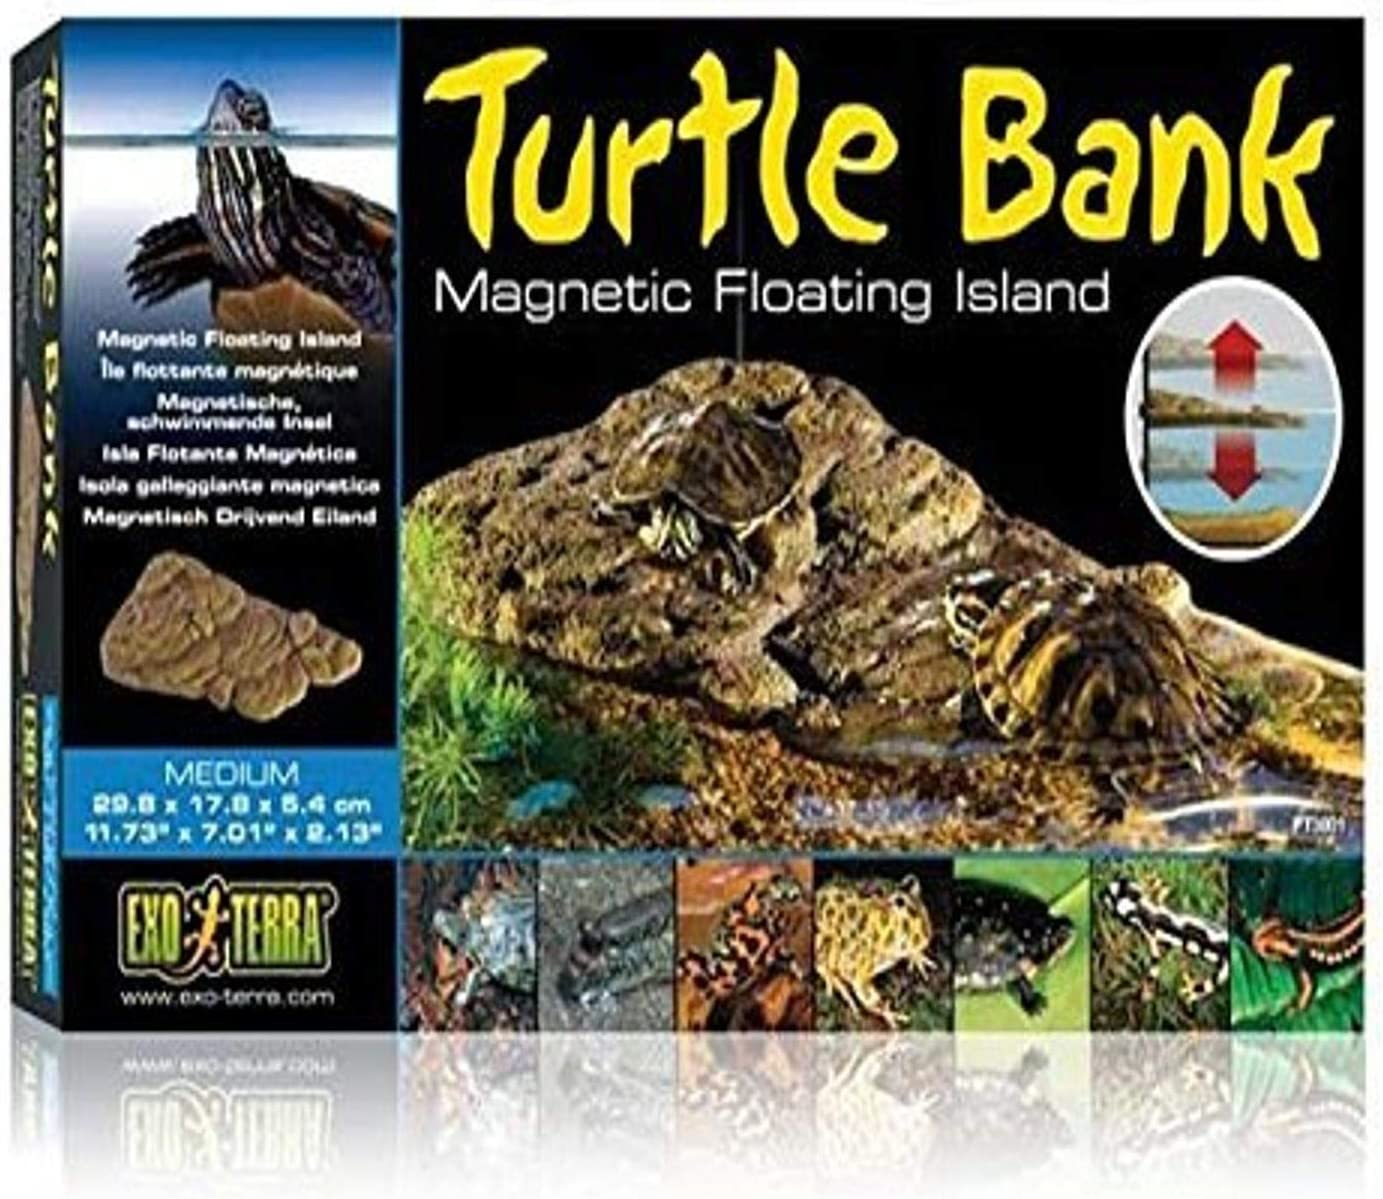 Exo Terra Turtle Bank, Magnetic Floating Island for Aquatic Turtle Terrariums